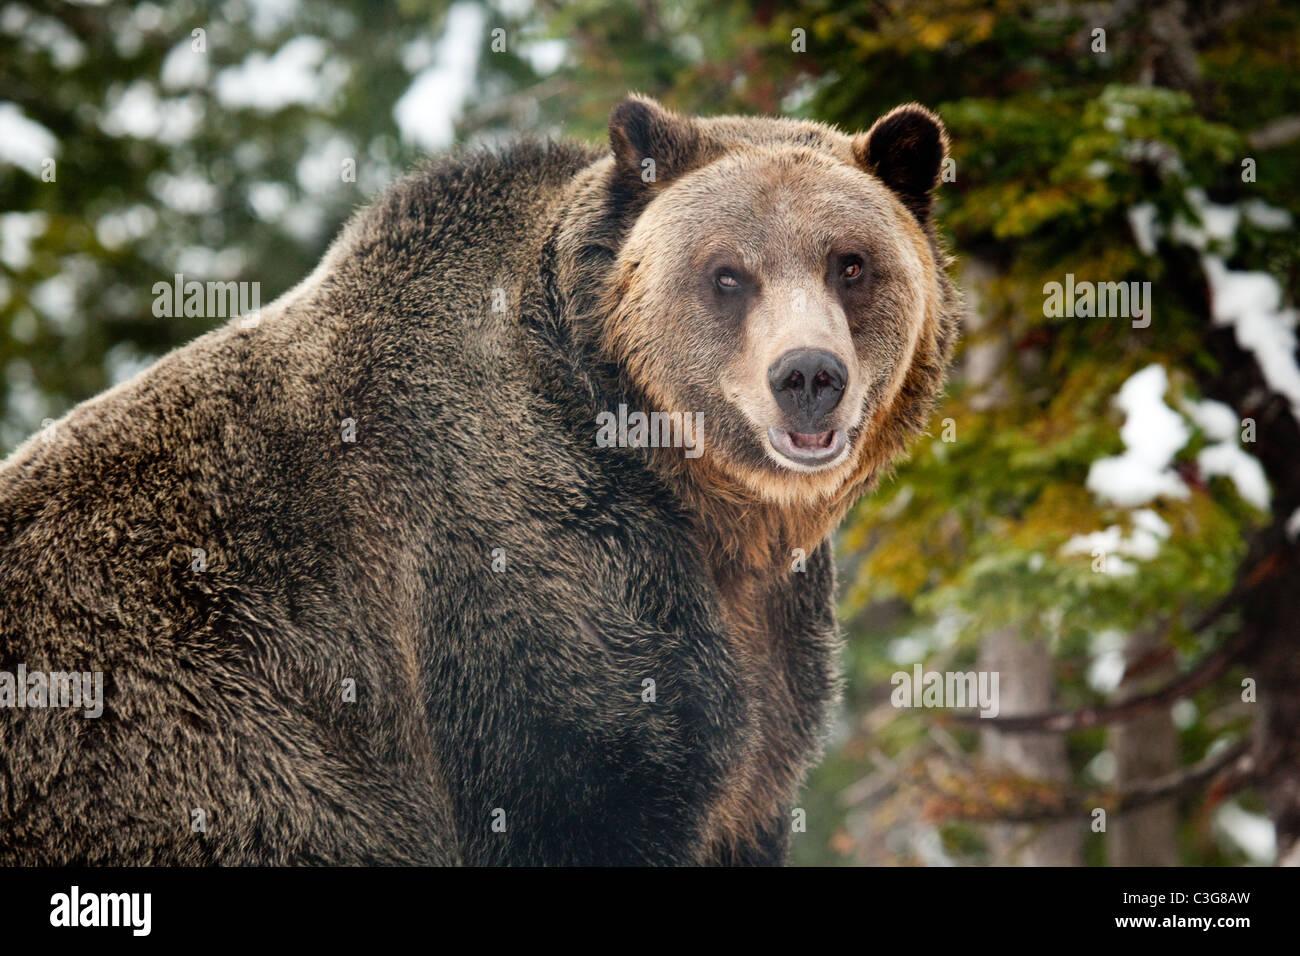 Grizzly bear (Ursus arctos horribilis) in outdoor closeup view. Stock Photo